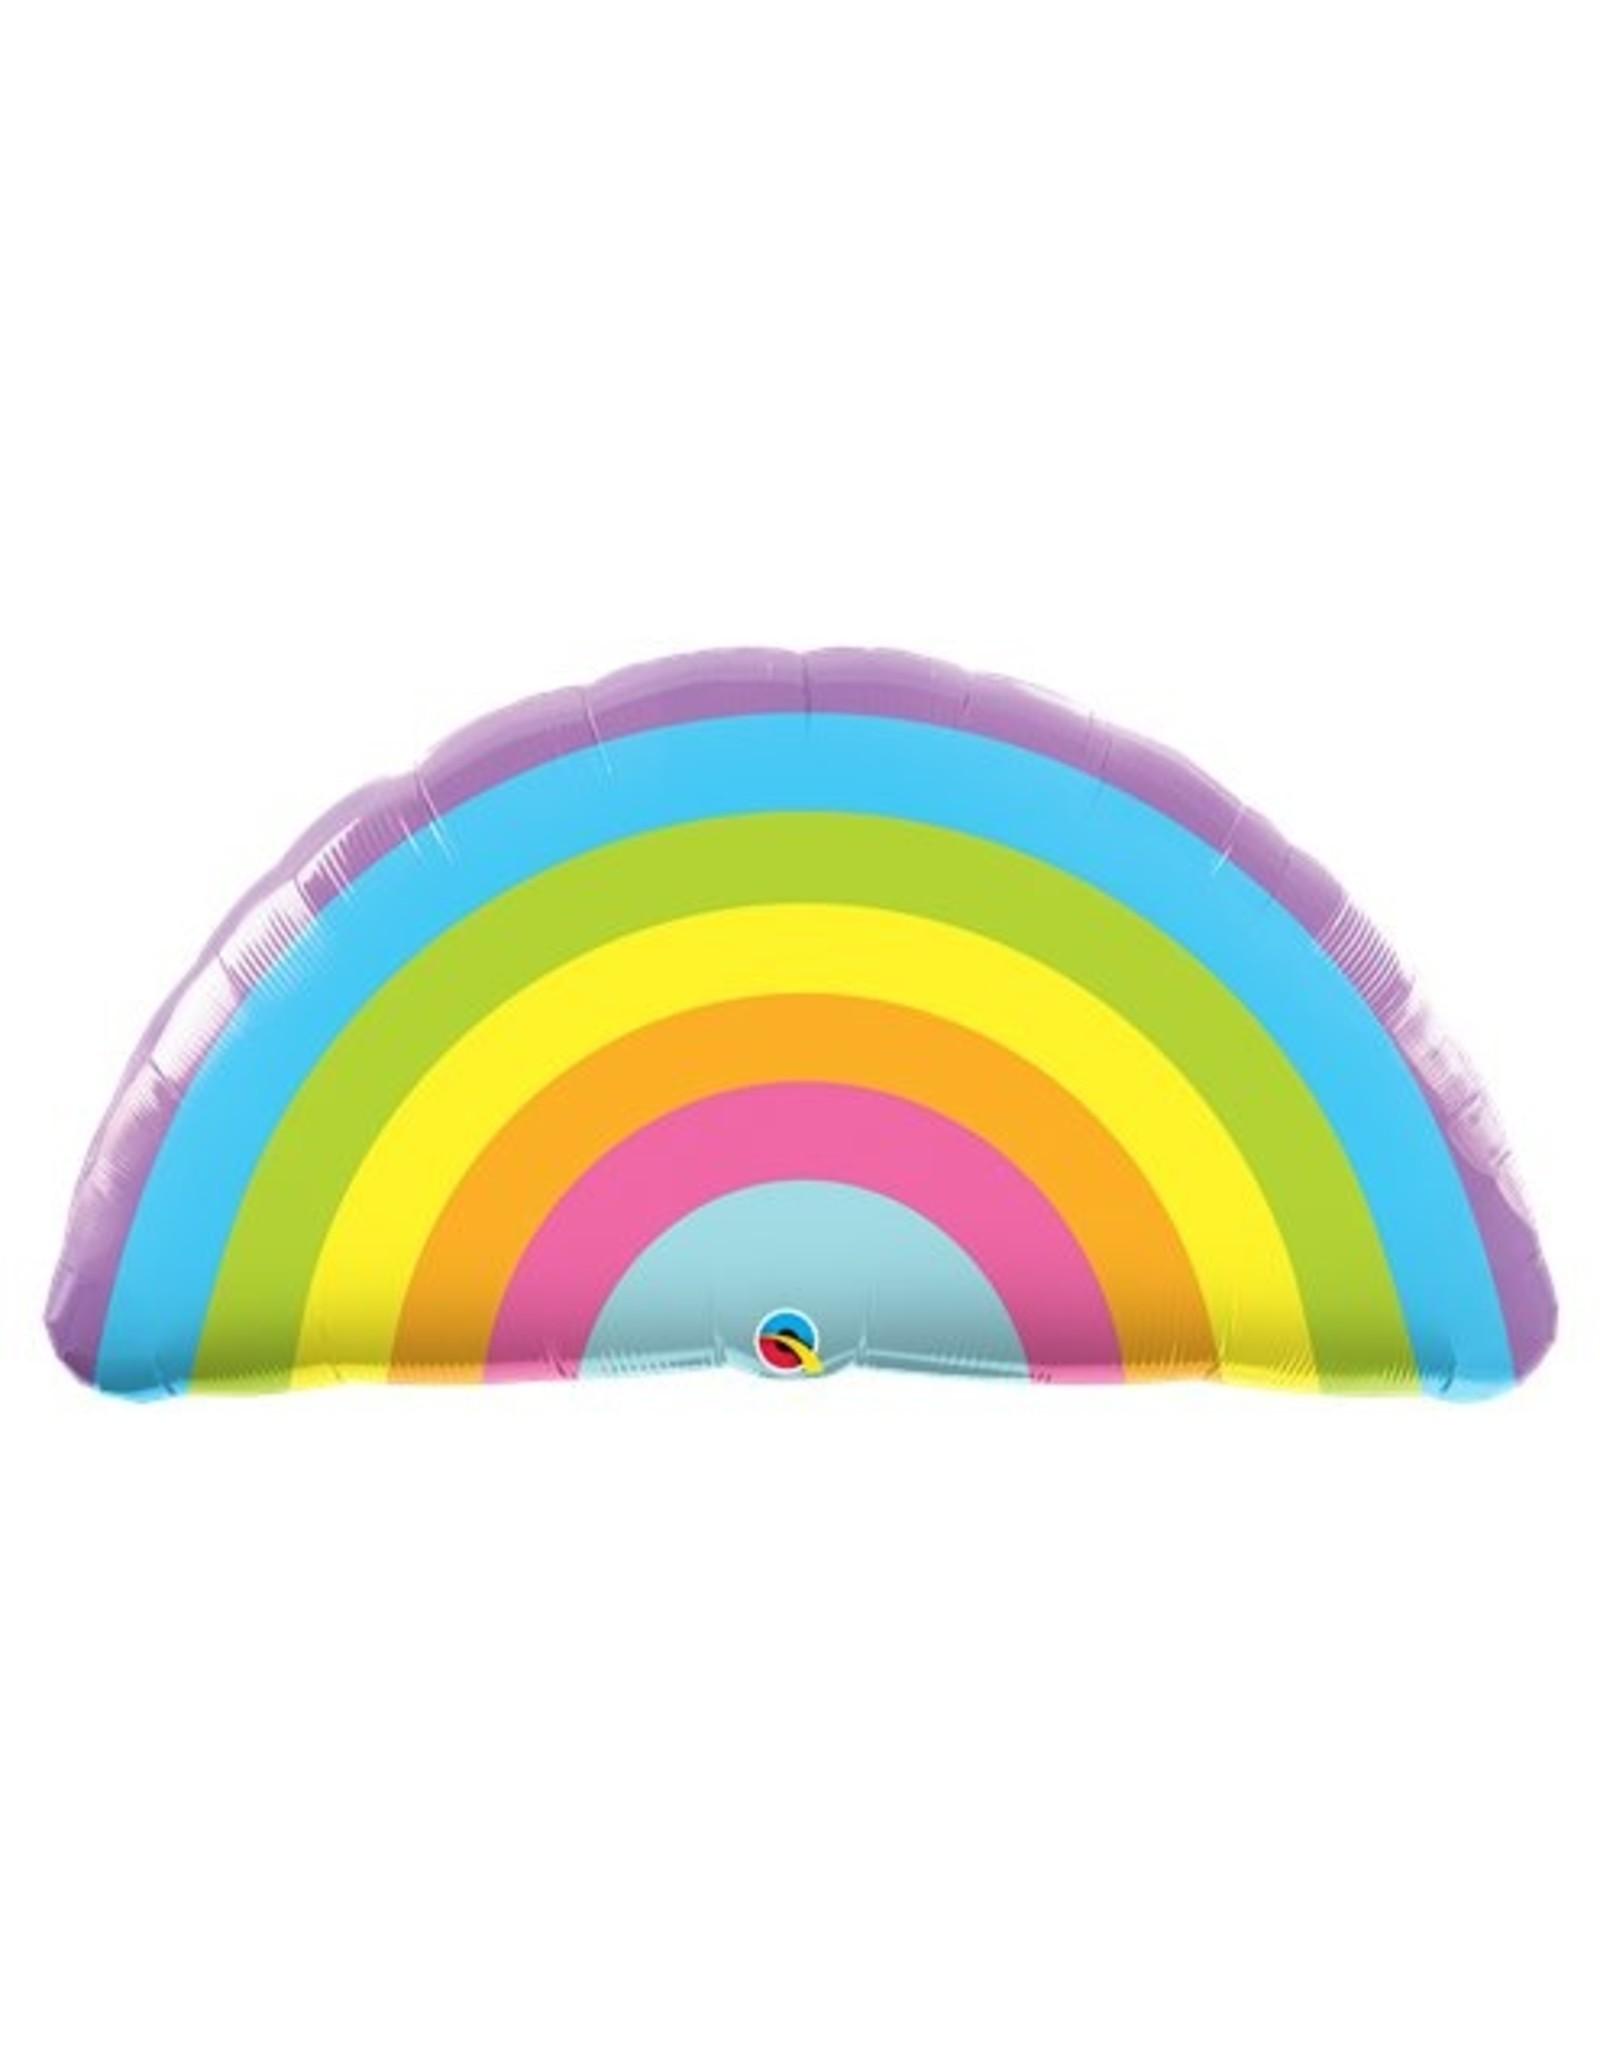 Supergrote regenboog folieballon 91 cm